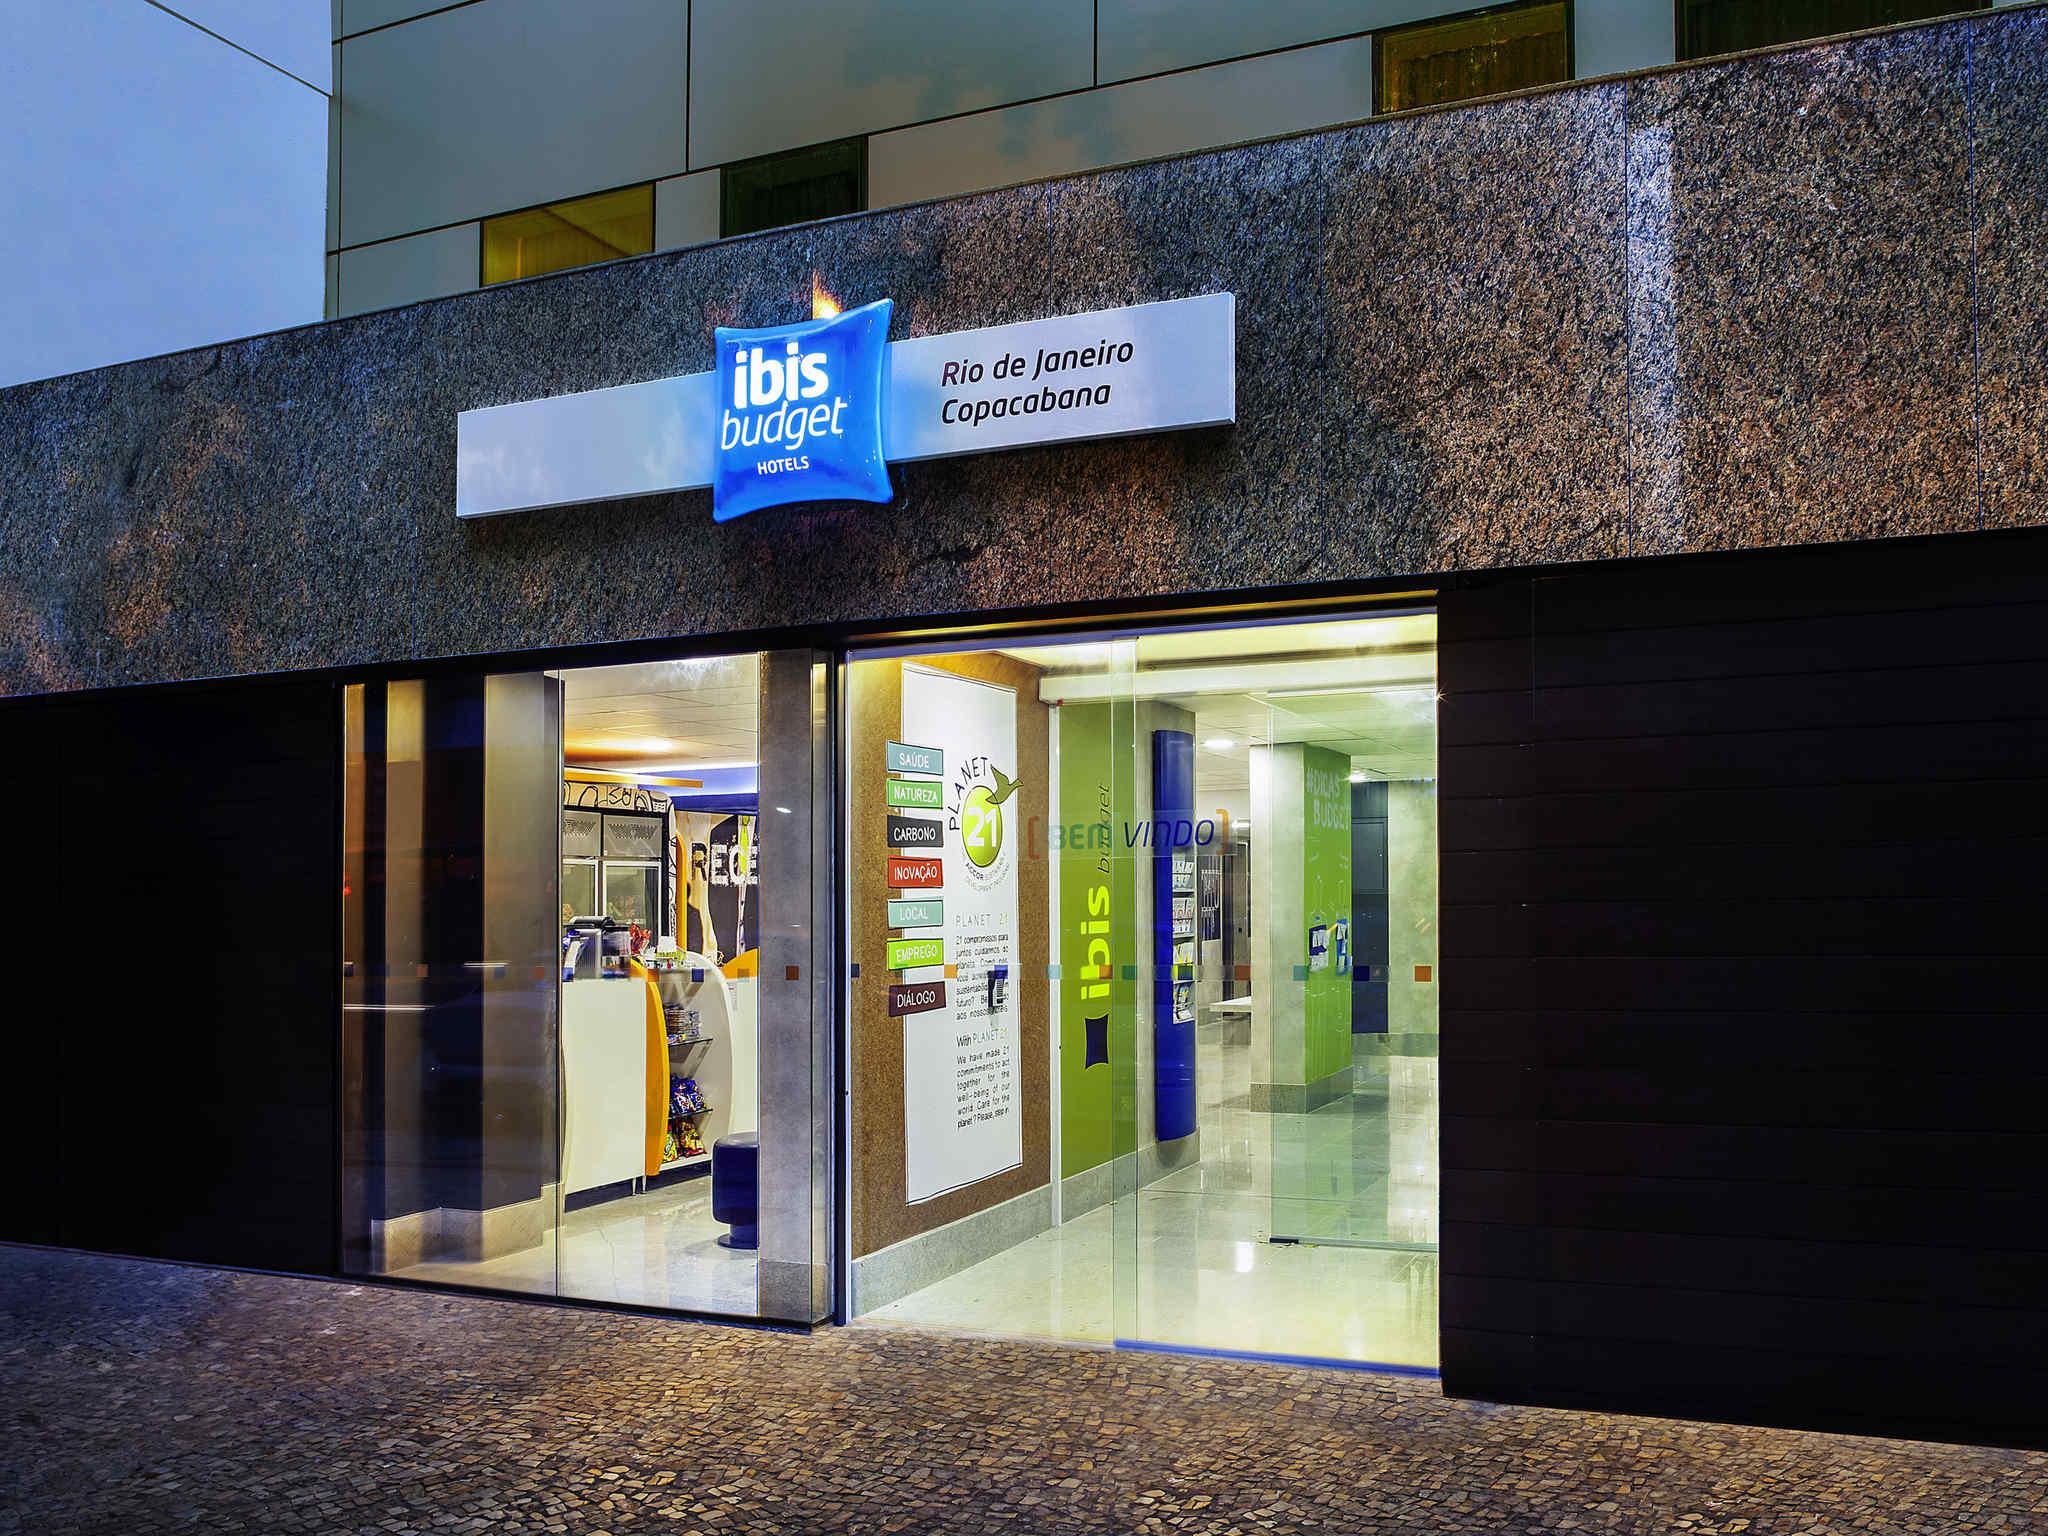 Hôtel - ibis budget Rj Copacabana